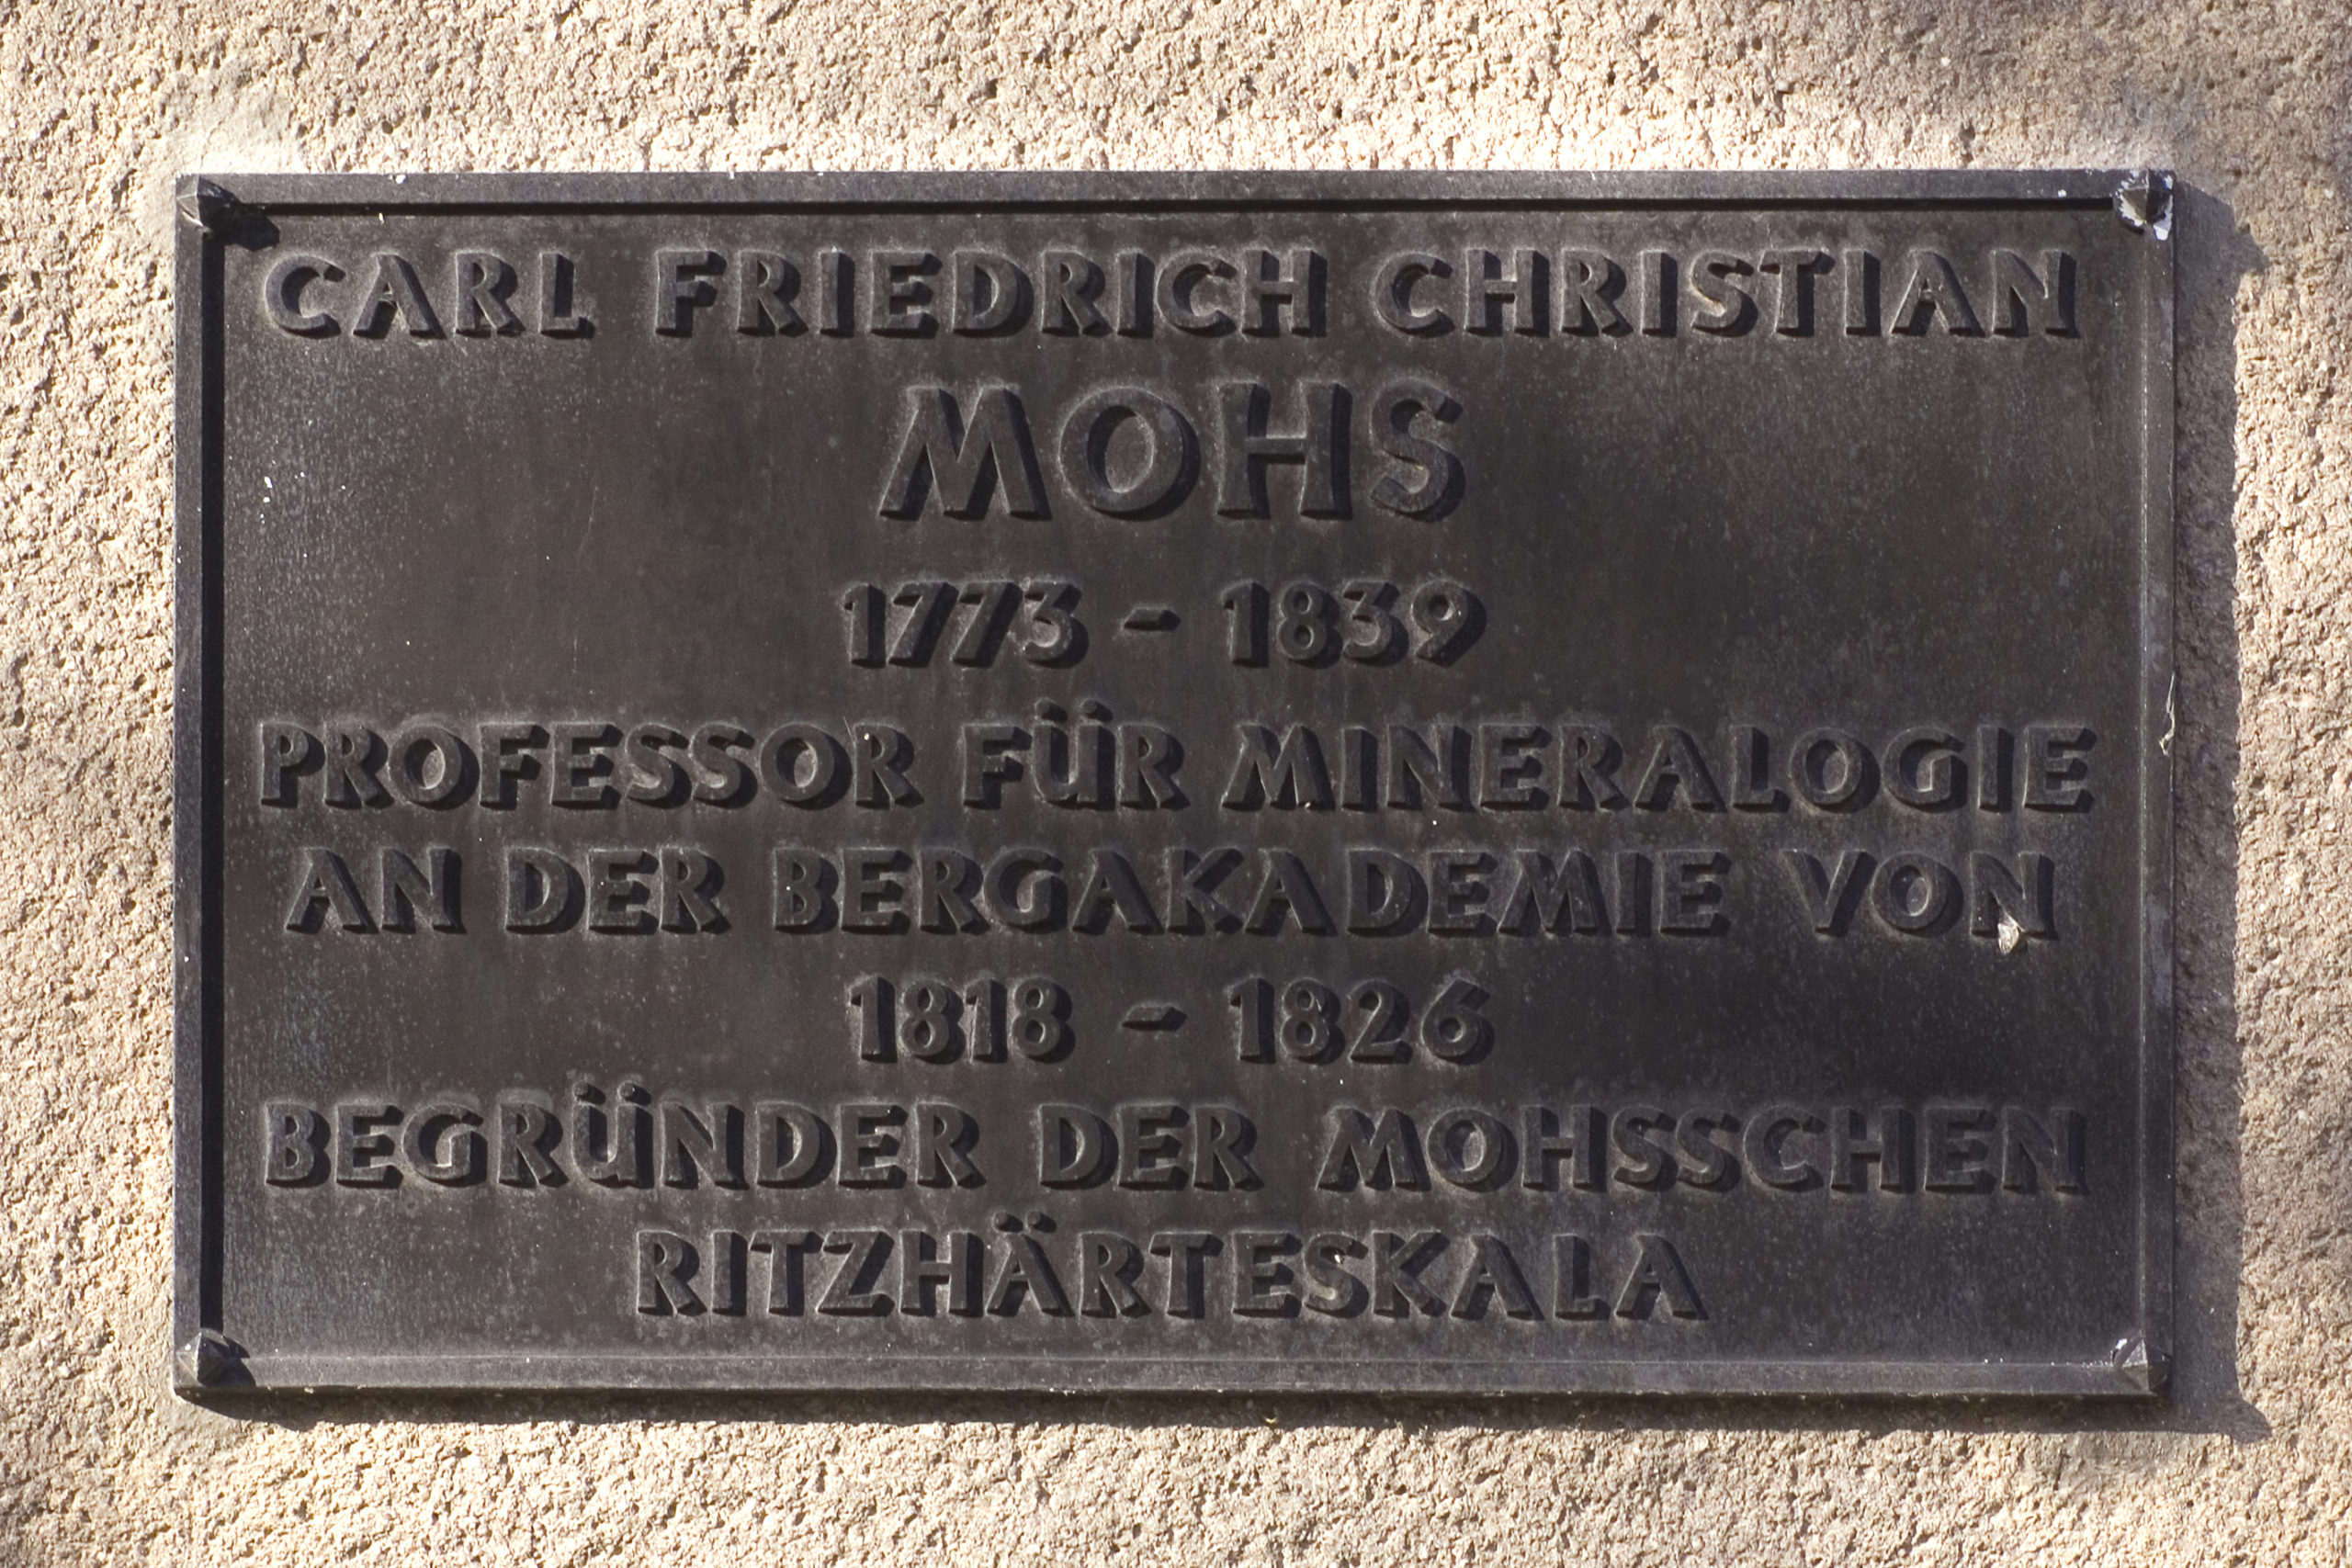 Mohs, Gedenktafel in Freiberg